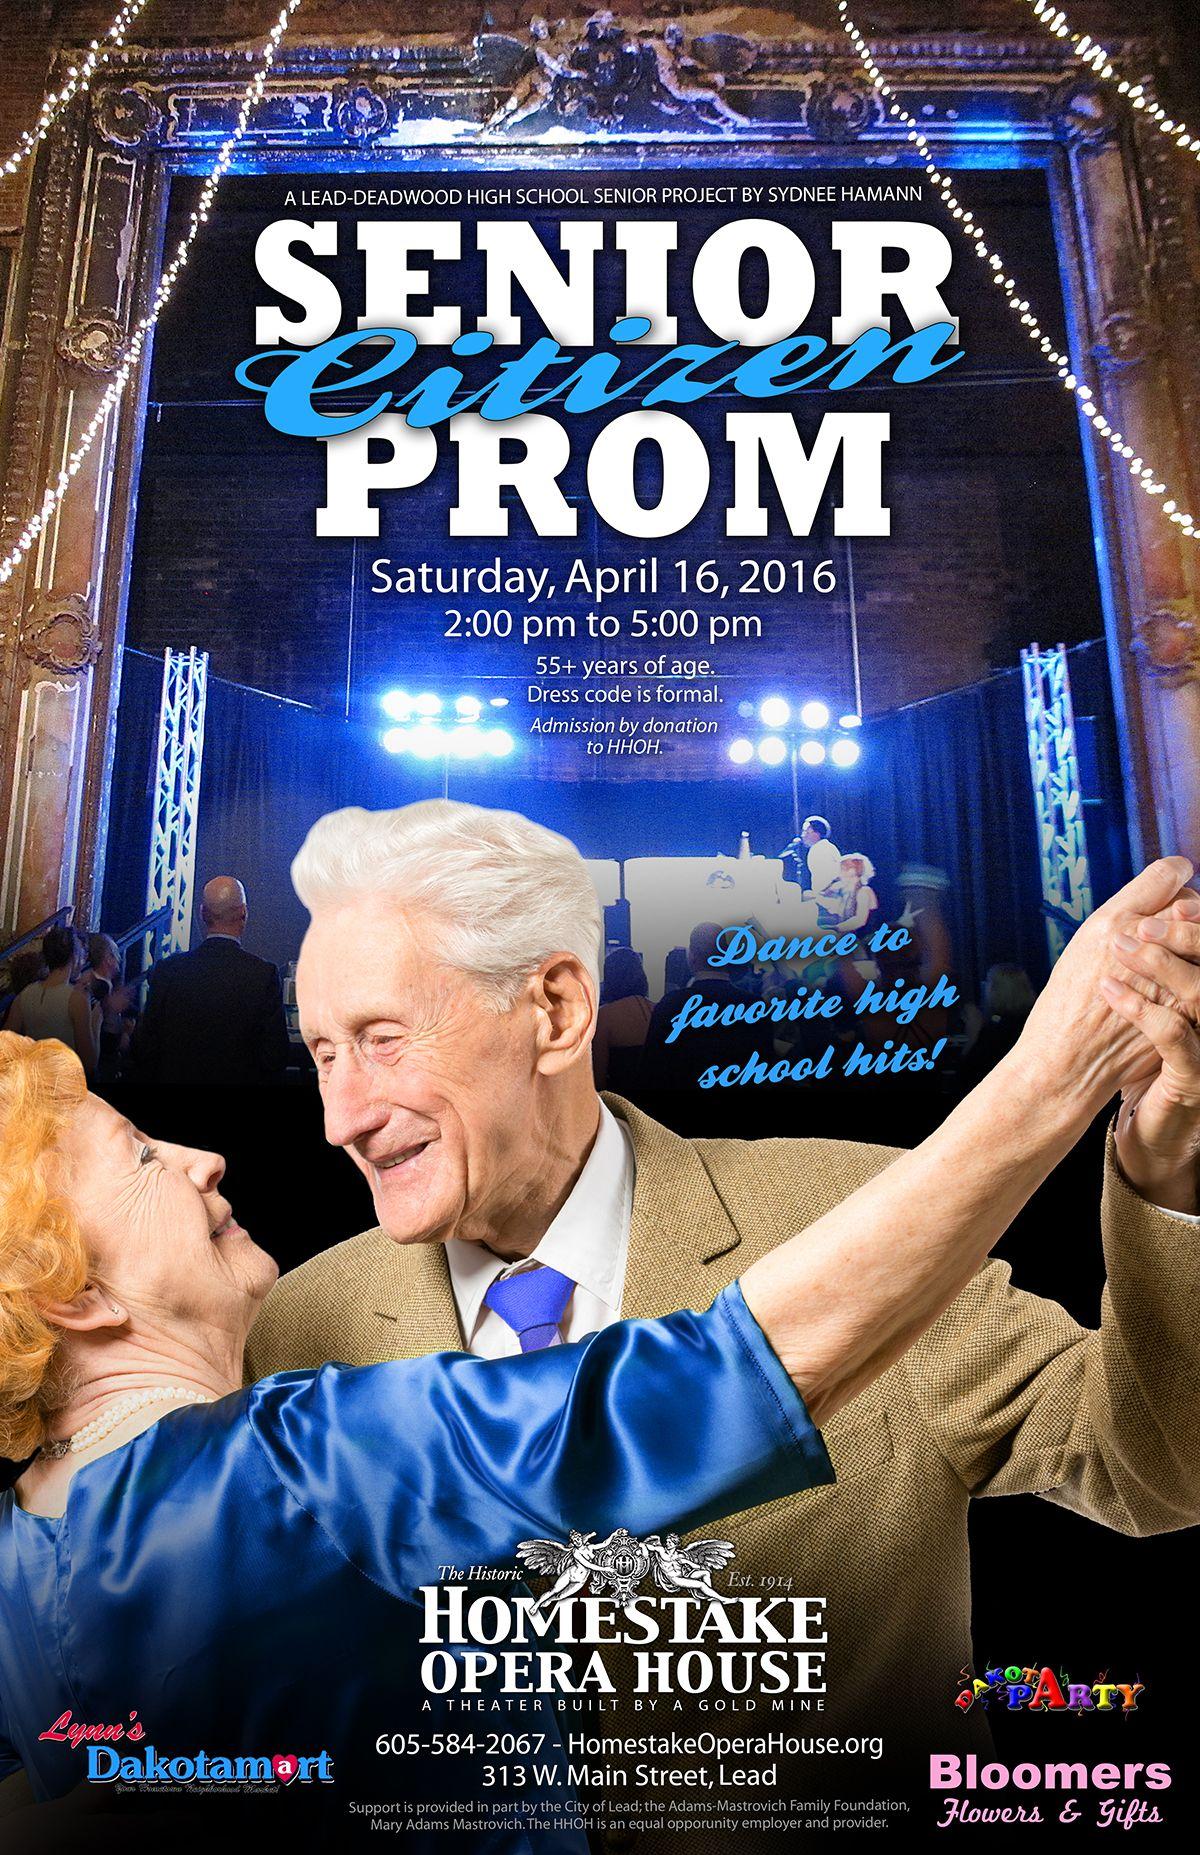 Senior Citizen Prom HomestakeOperaHouse findyourfun